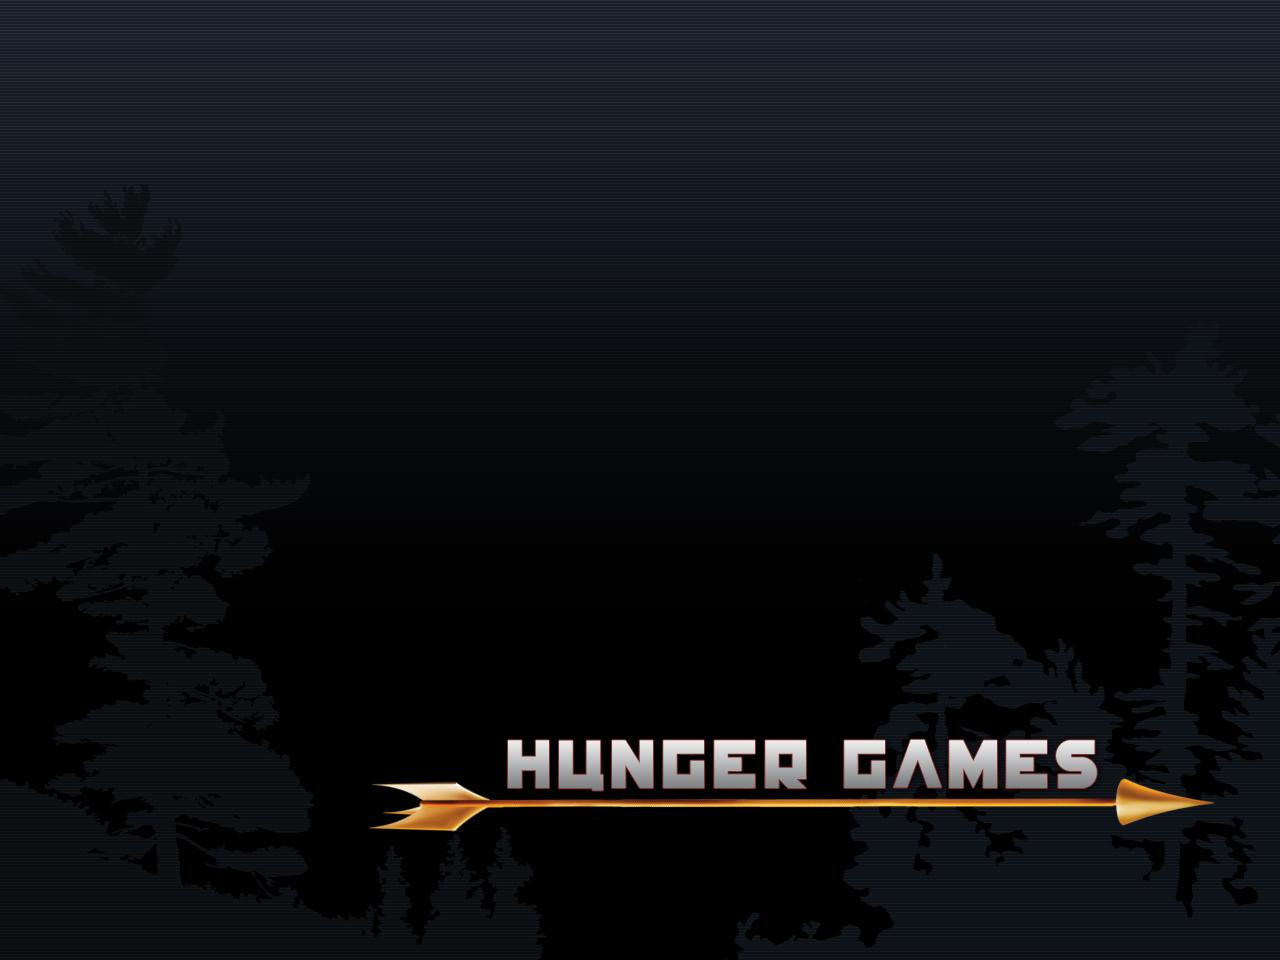 hunger games essays mfacourses web fc com hunger games essays